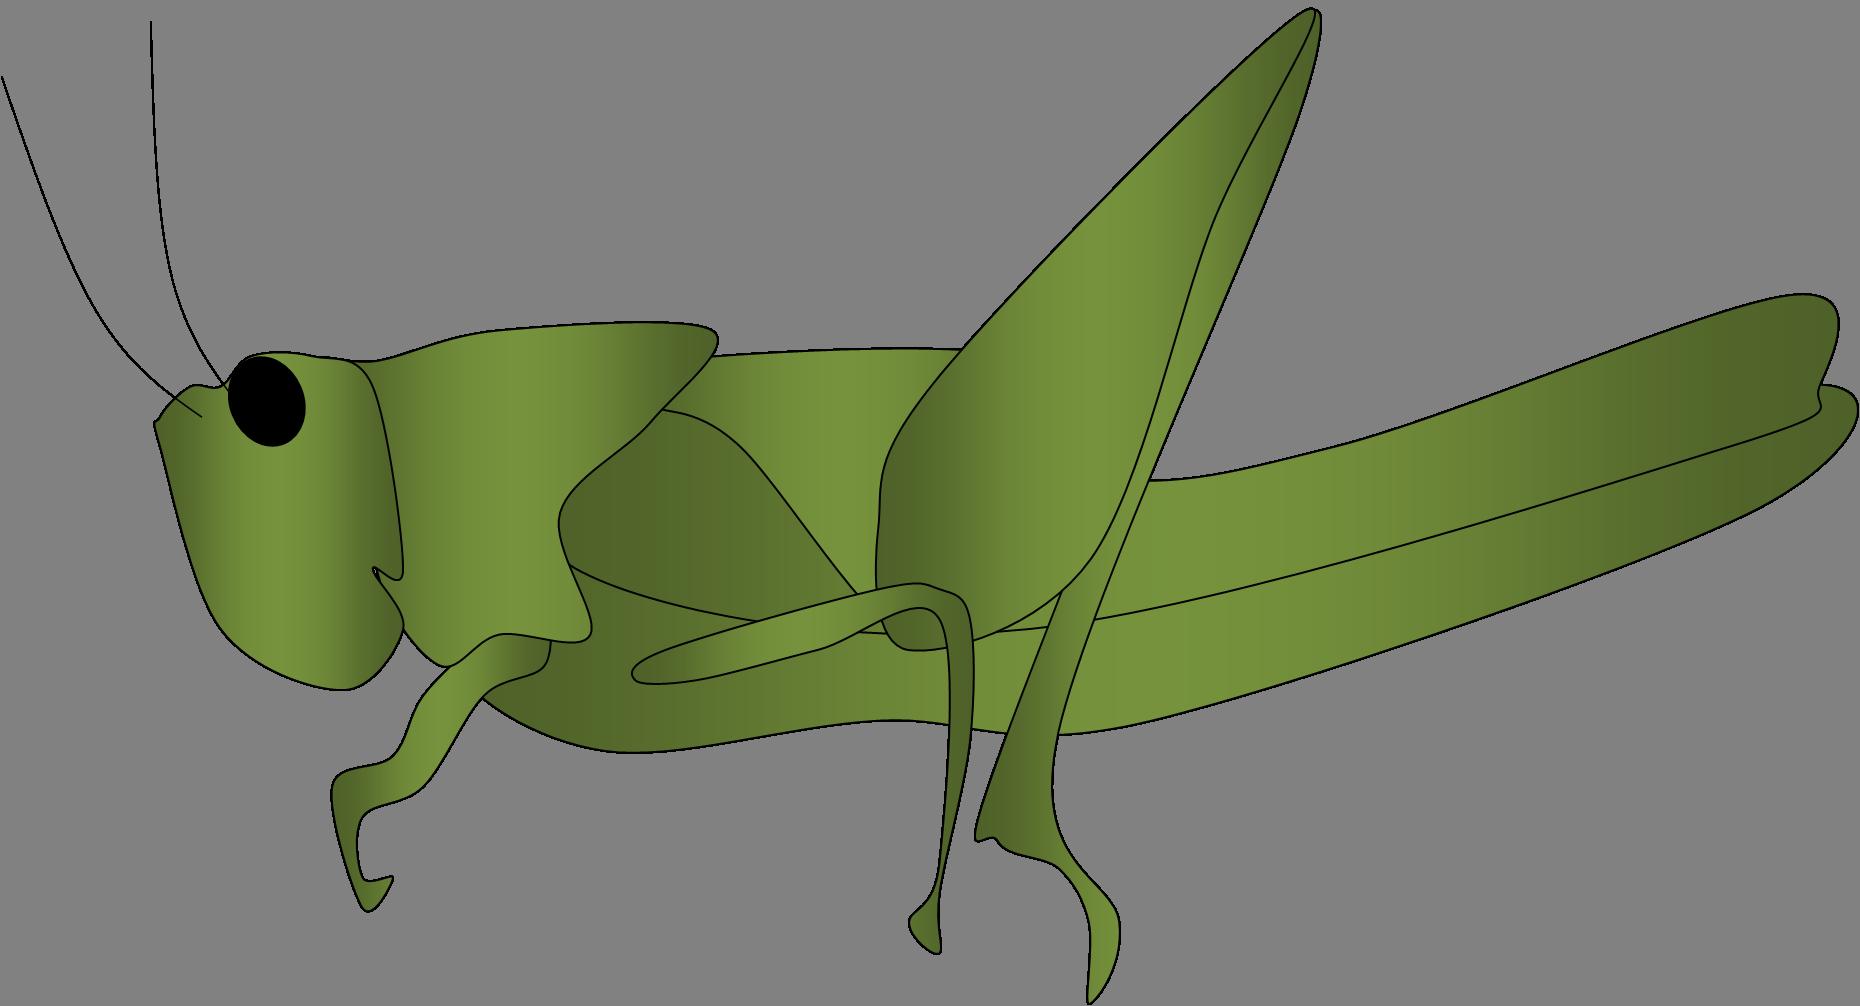 Grasshopper Outline | Clipart Panda - Free Clipart Images ...